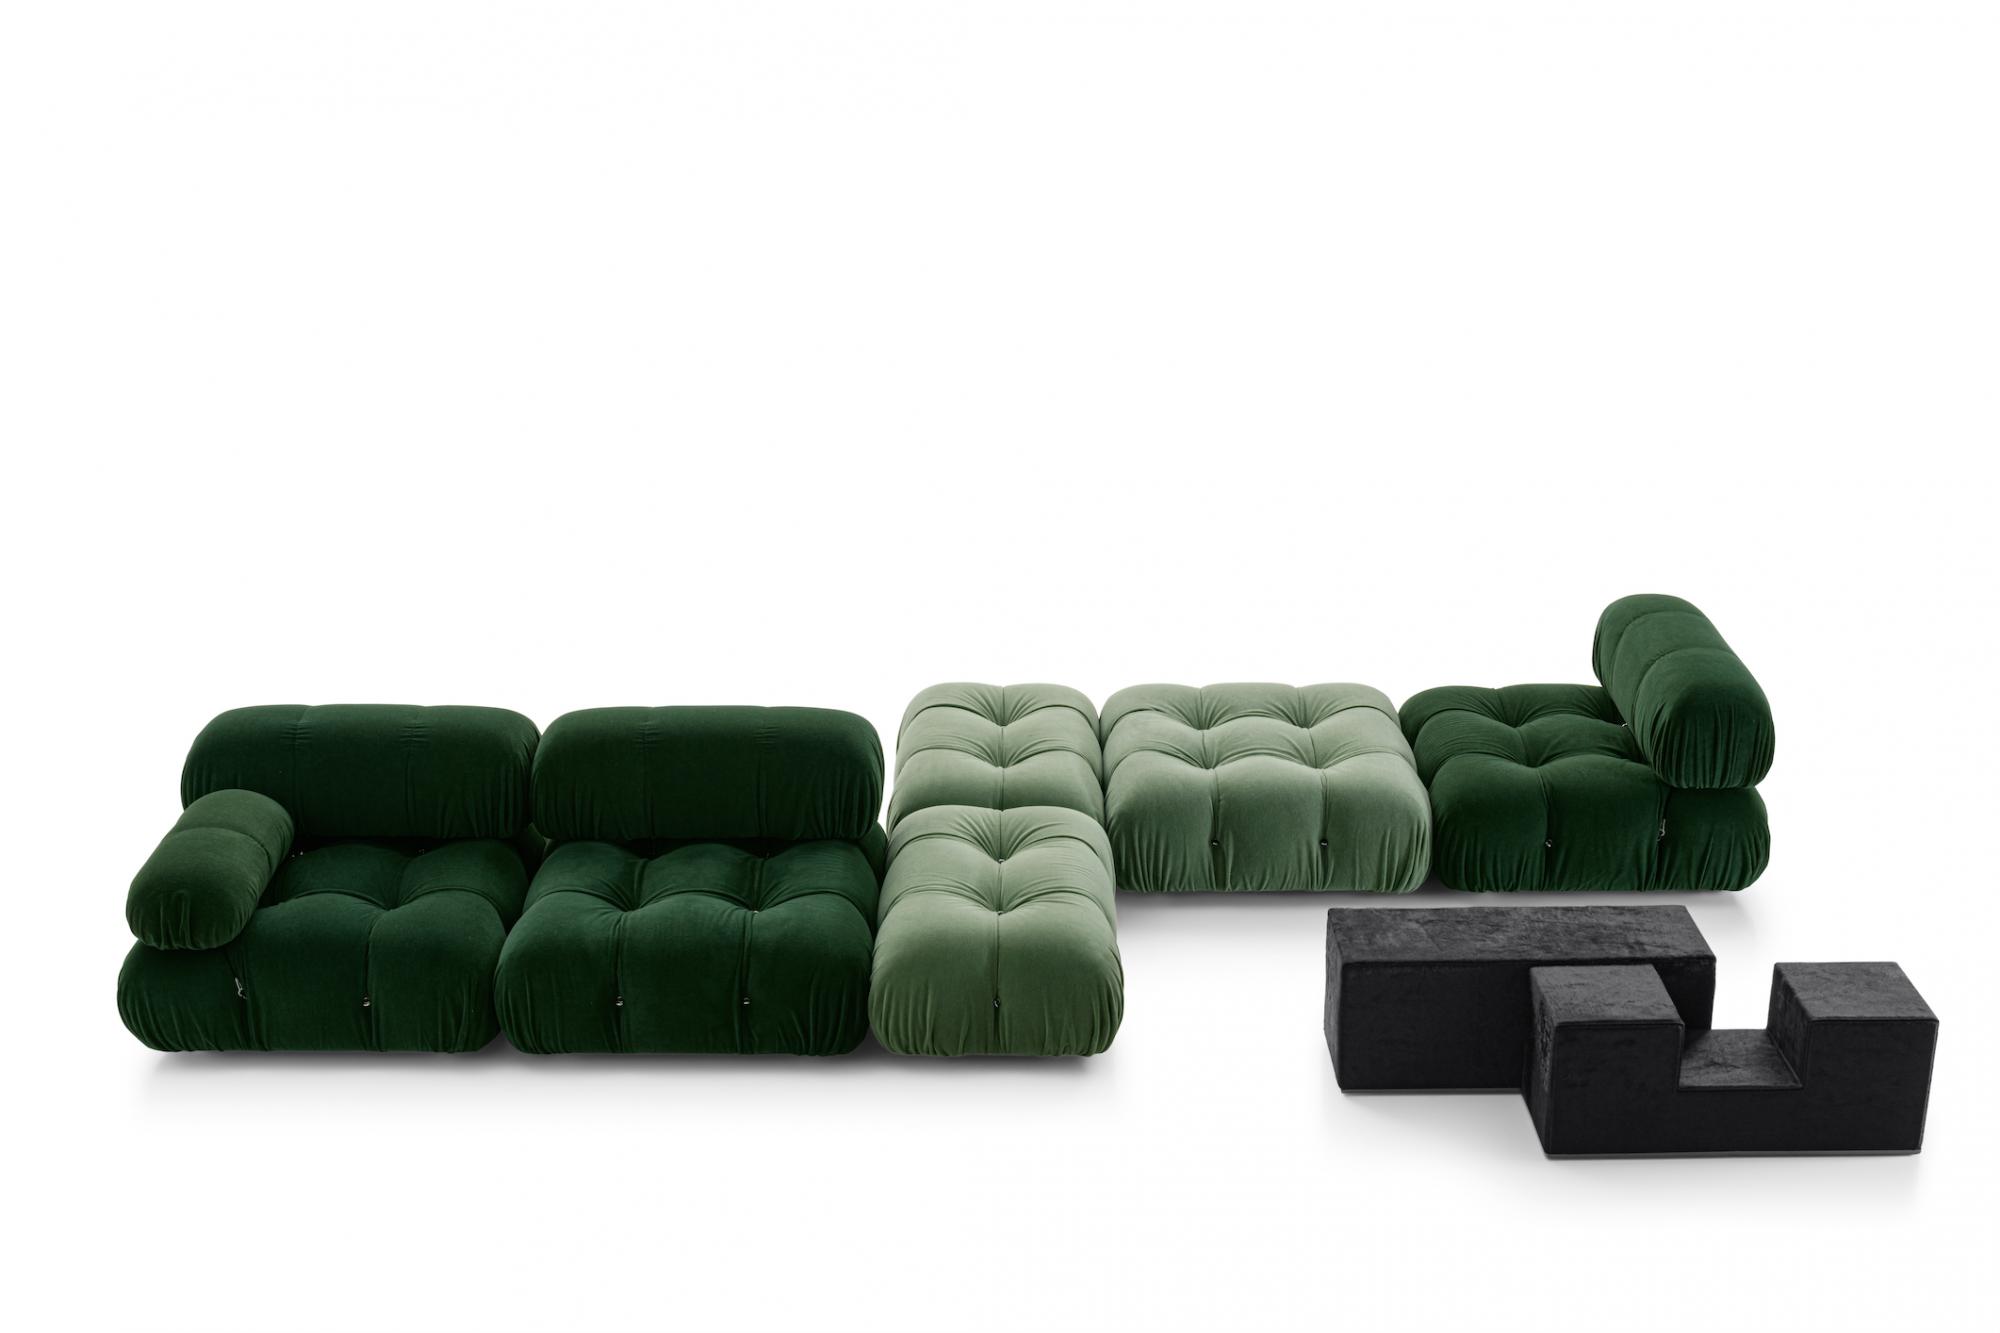 B&B Italia's Camaleonda Sofa: 1 Sofa, Infinite Ways